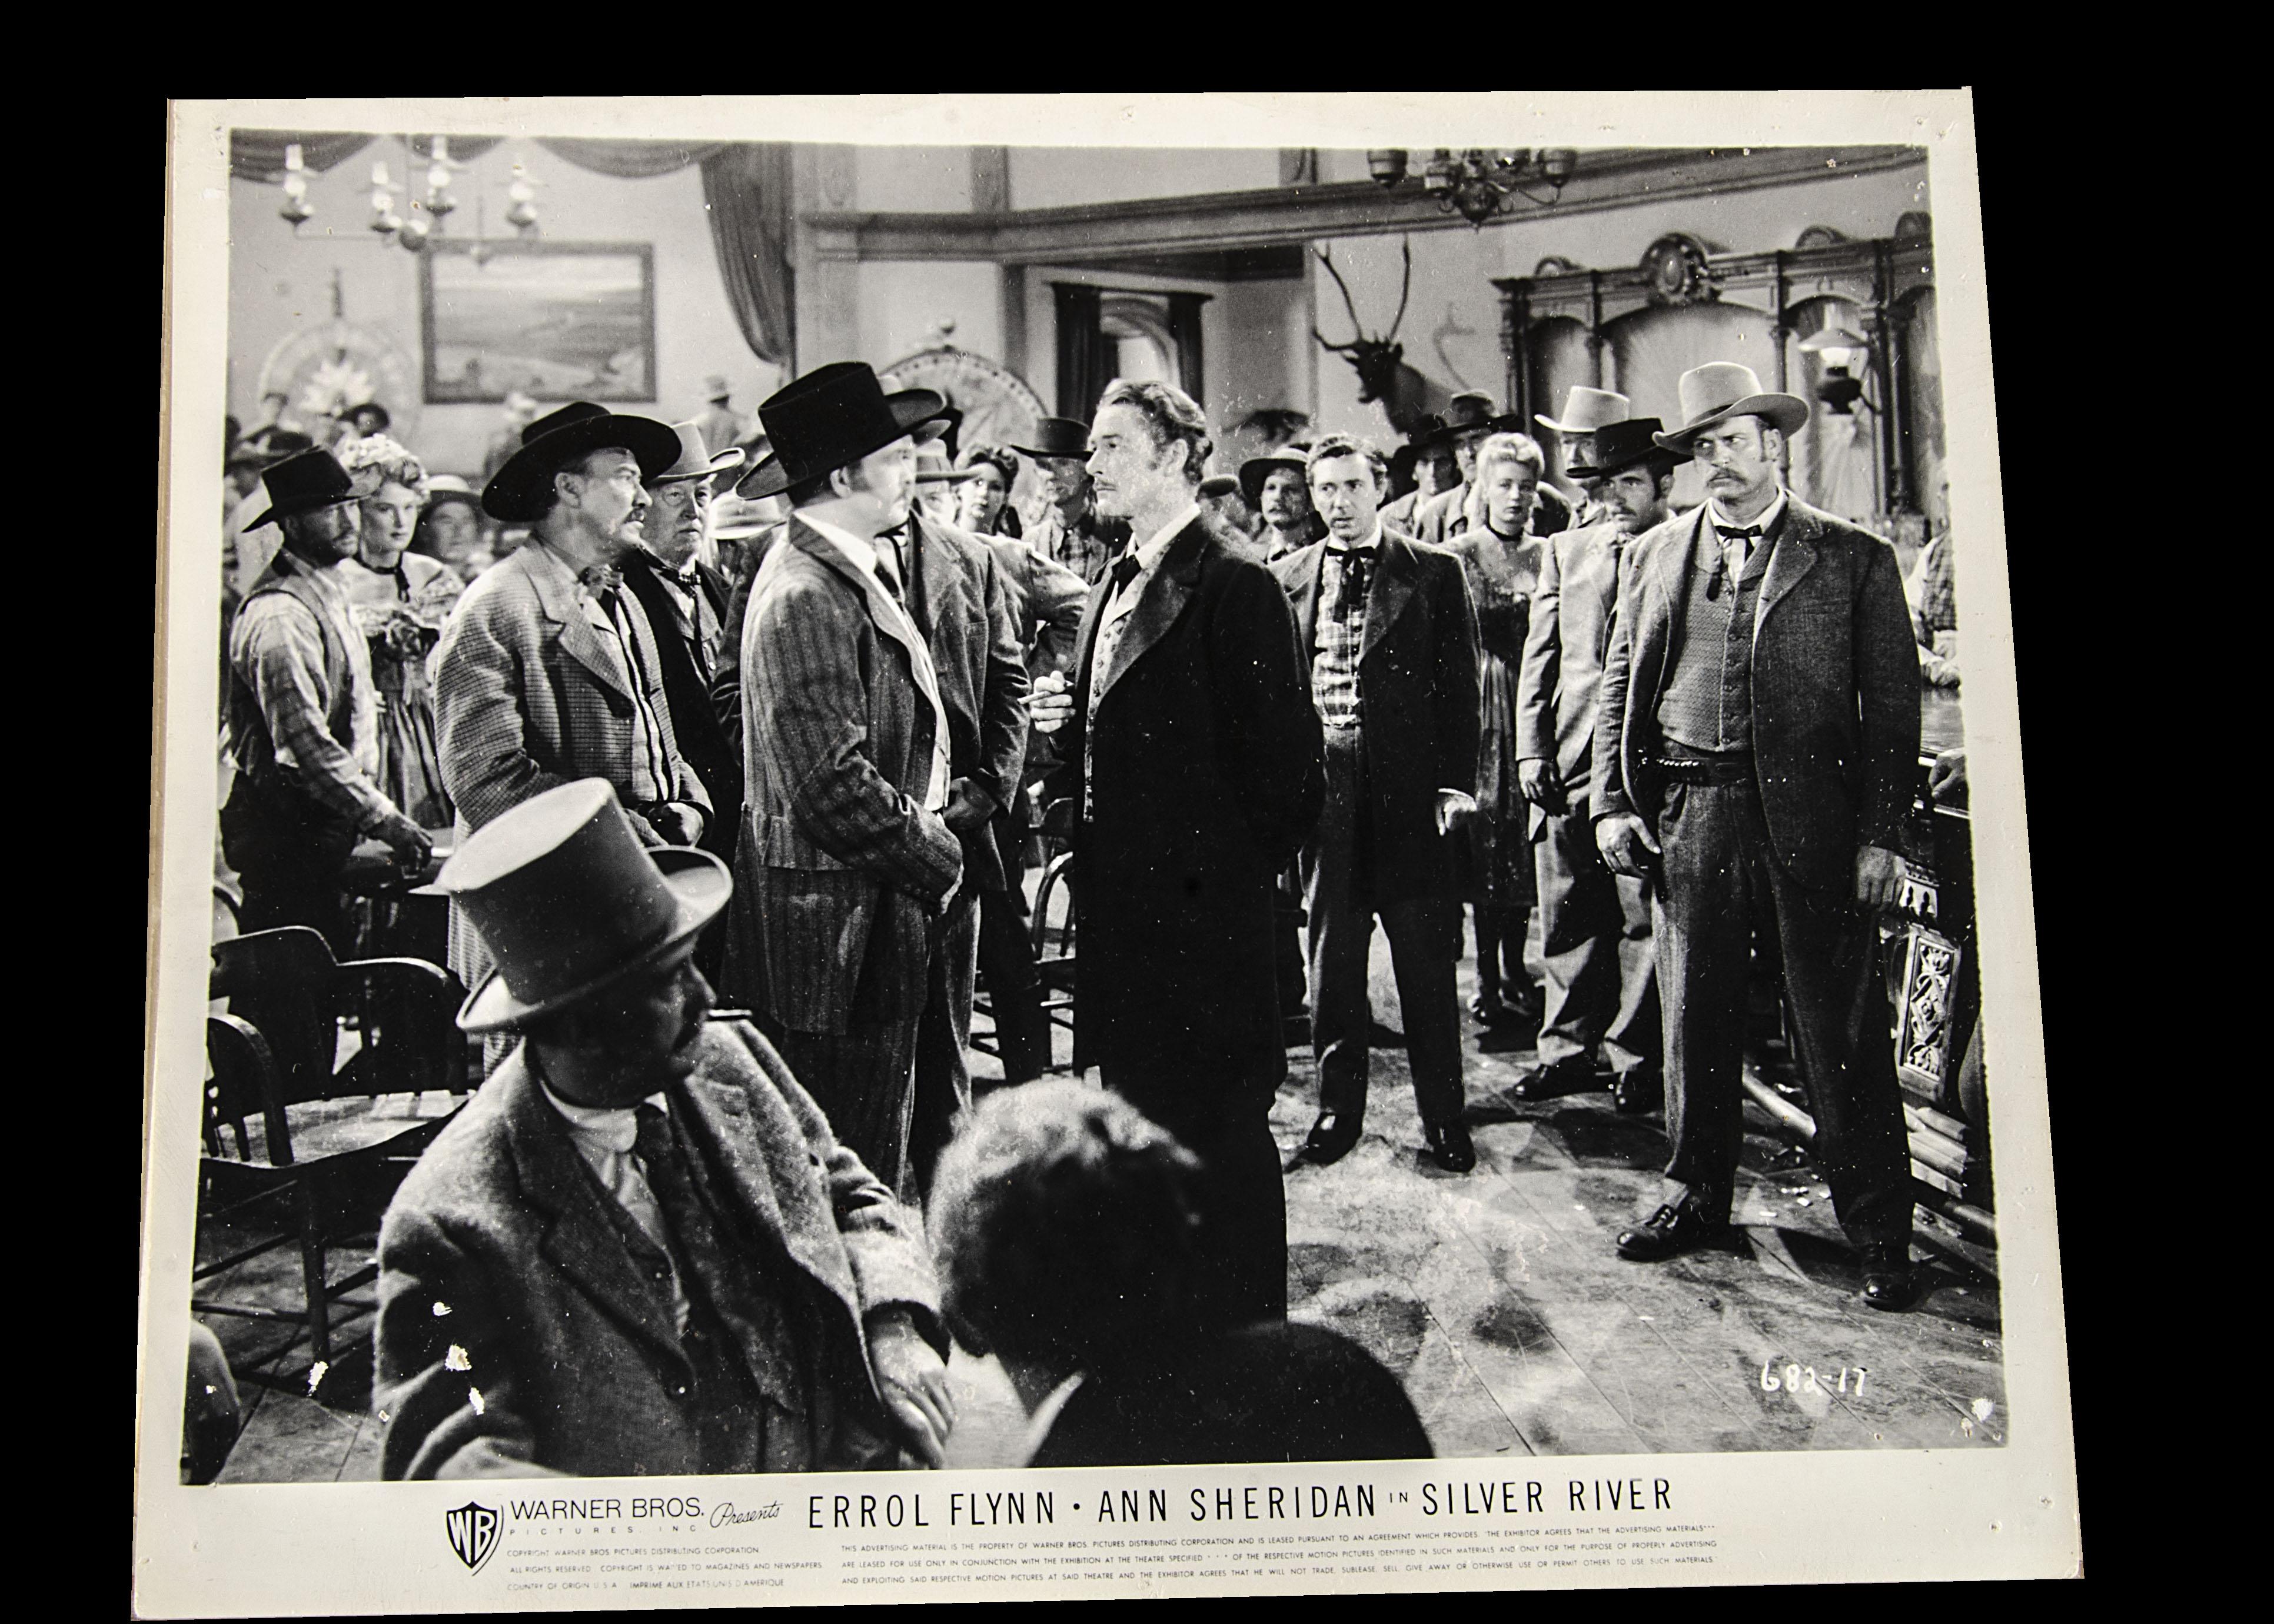 Errol Flynn Film Stills, approximately eighty b/w stills from Errol Flynn Western films that - Image 2 of 2